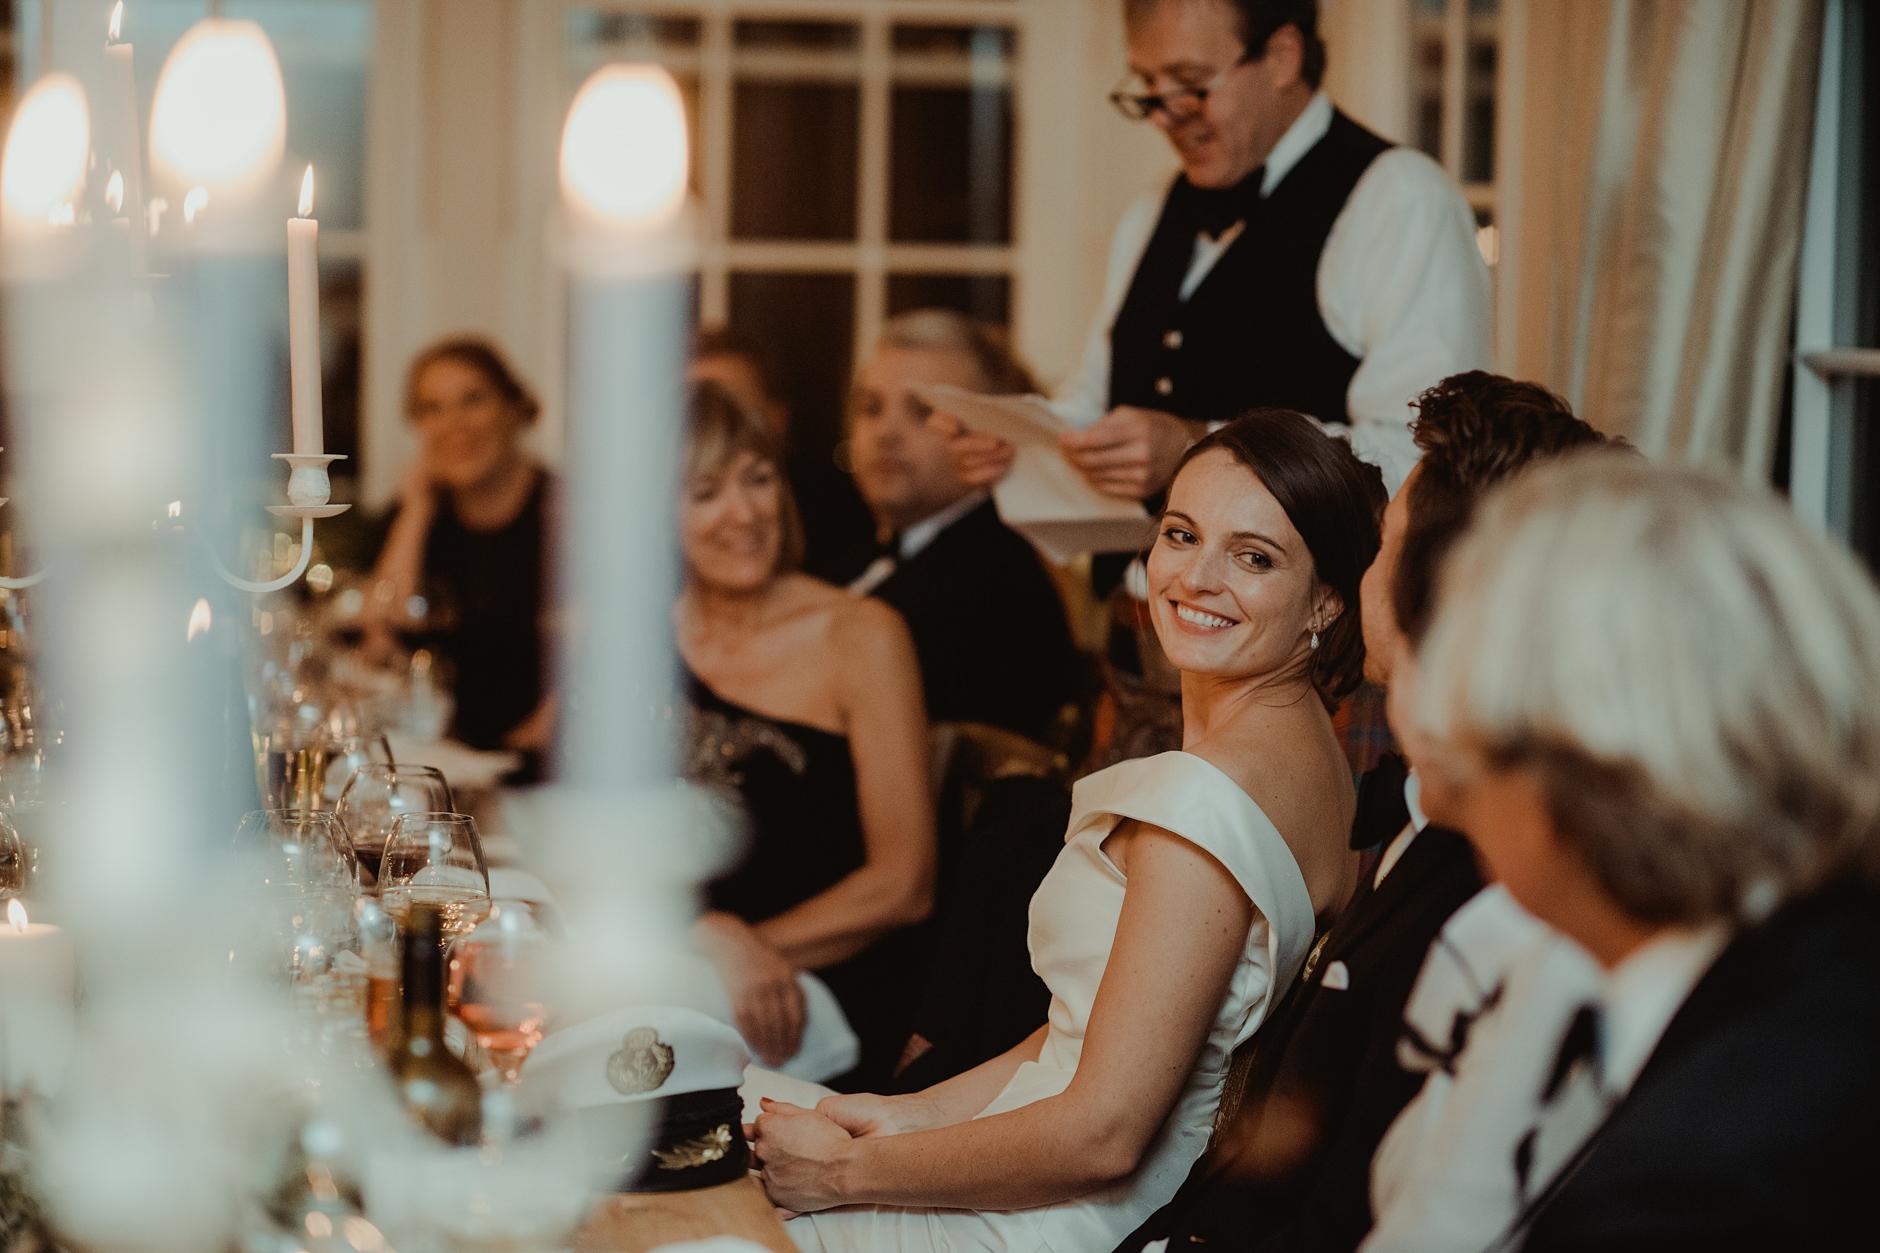 Glentruim-Wedding-Nikki-Leadbetter-Photography-272.jpg